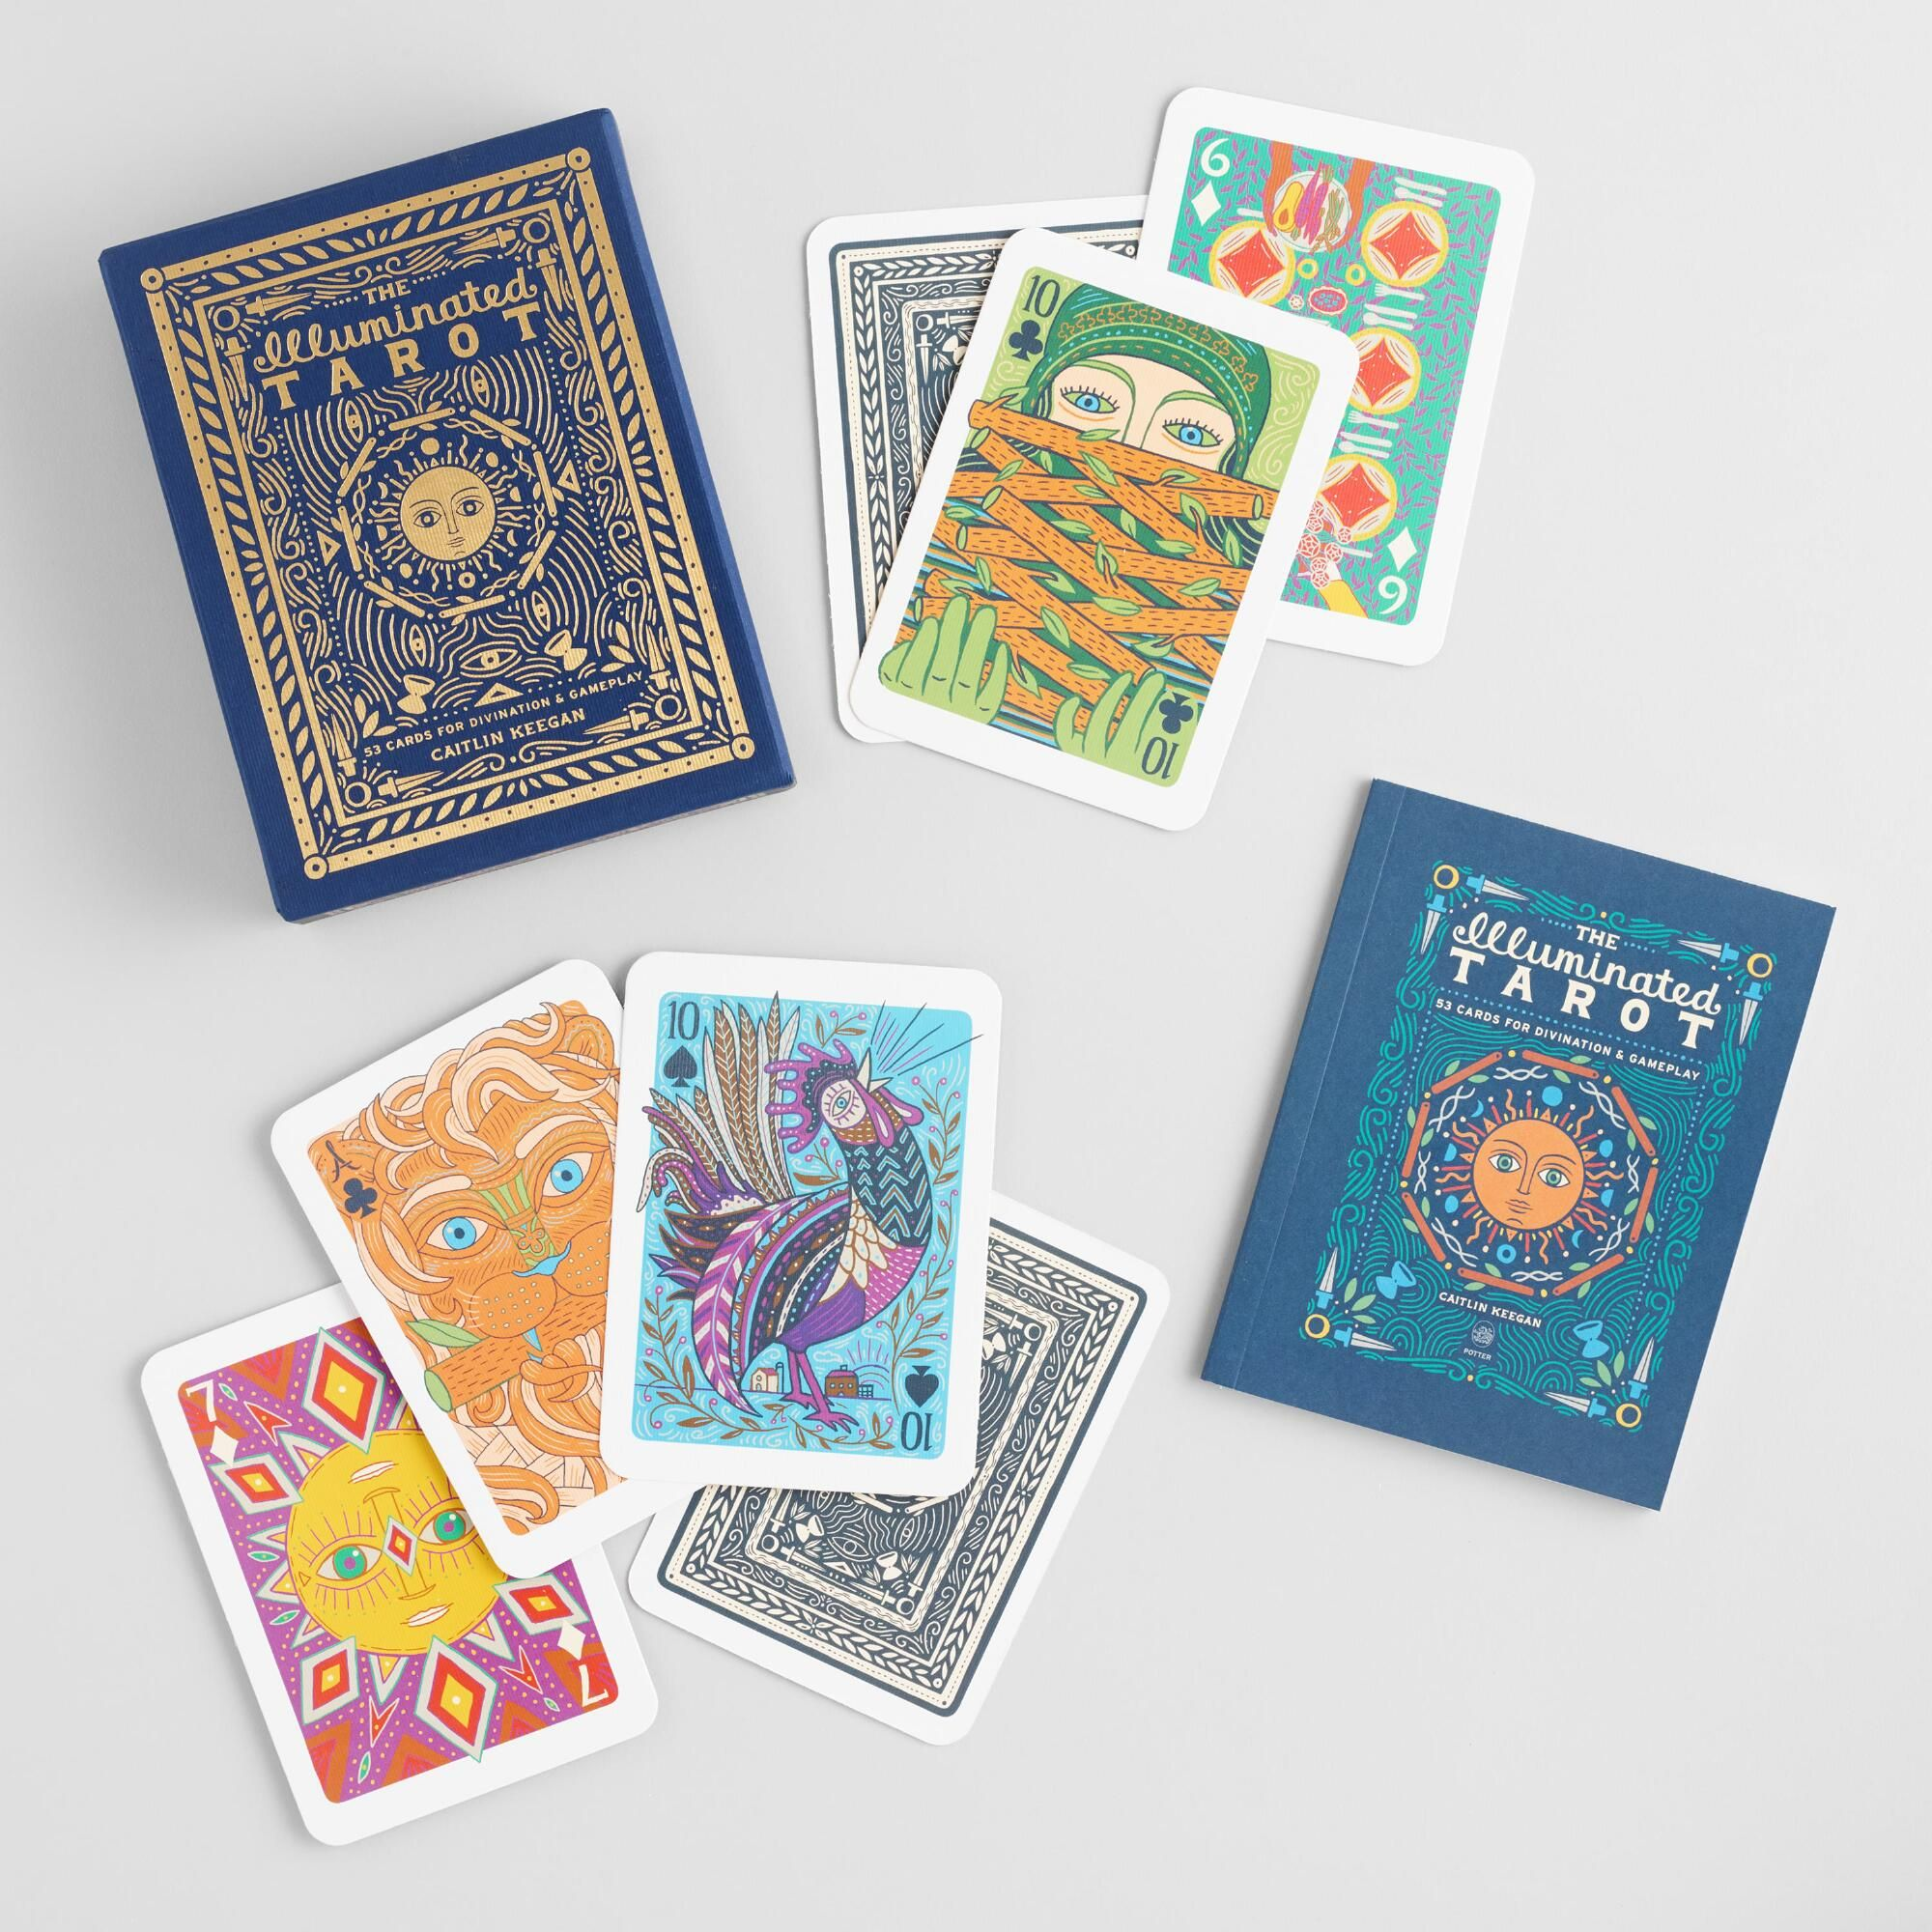 The Illuminated Tarot Playing Cards by World Market Fun